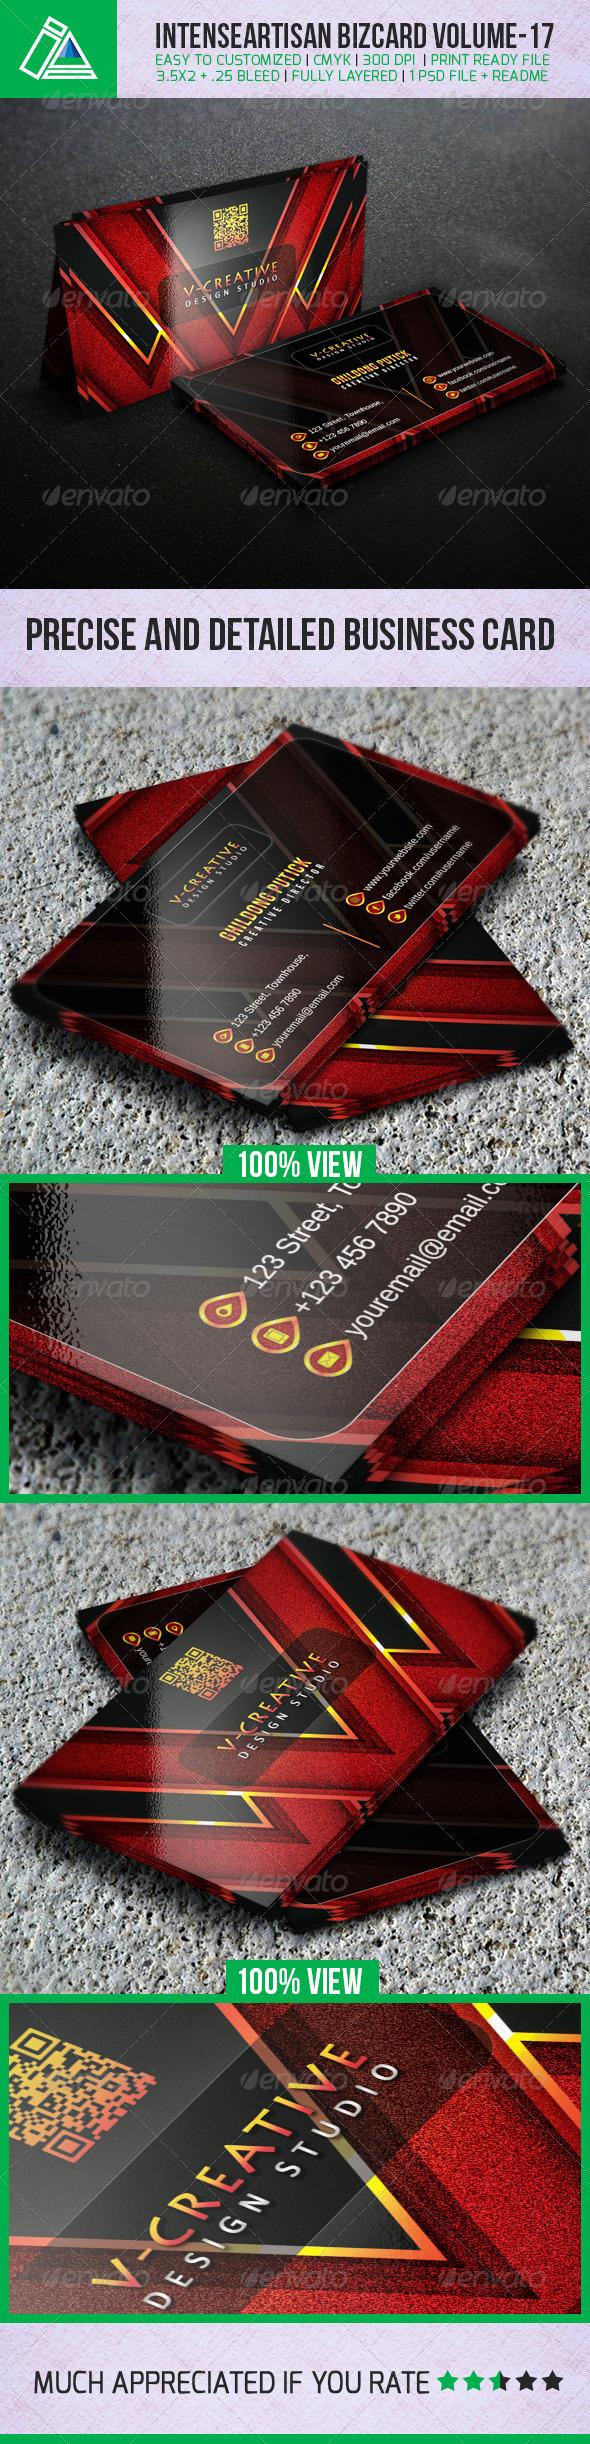 IntenseArtisan Creative Business Card Vol-17 - Creative Business Cards